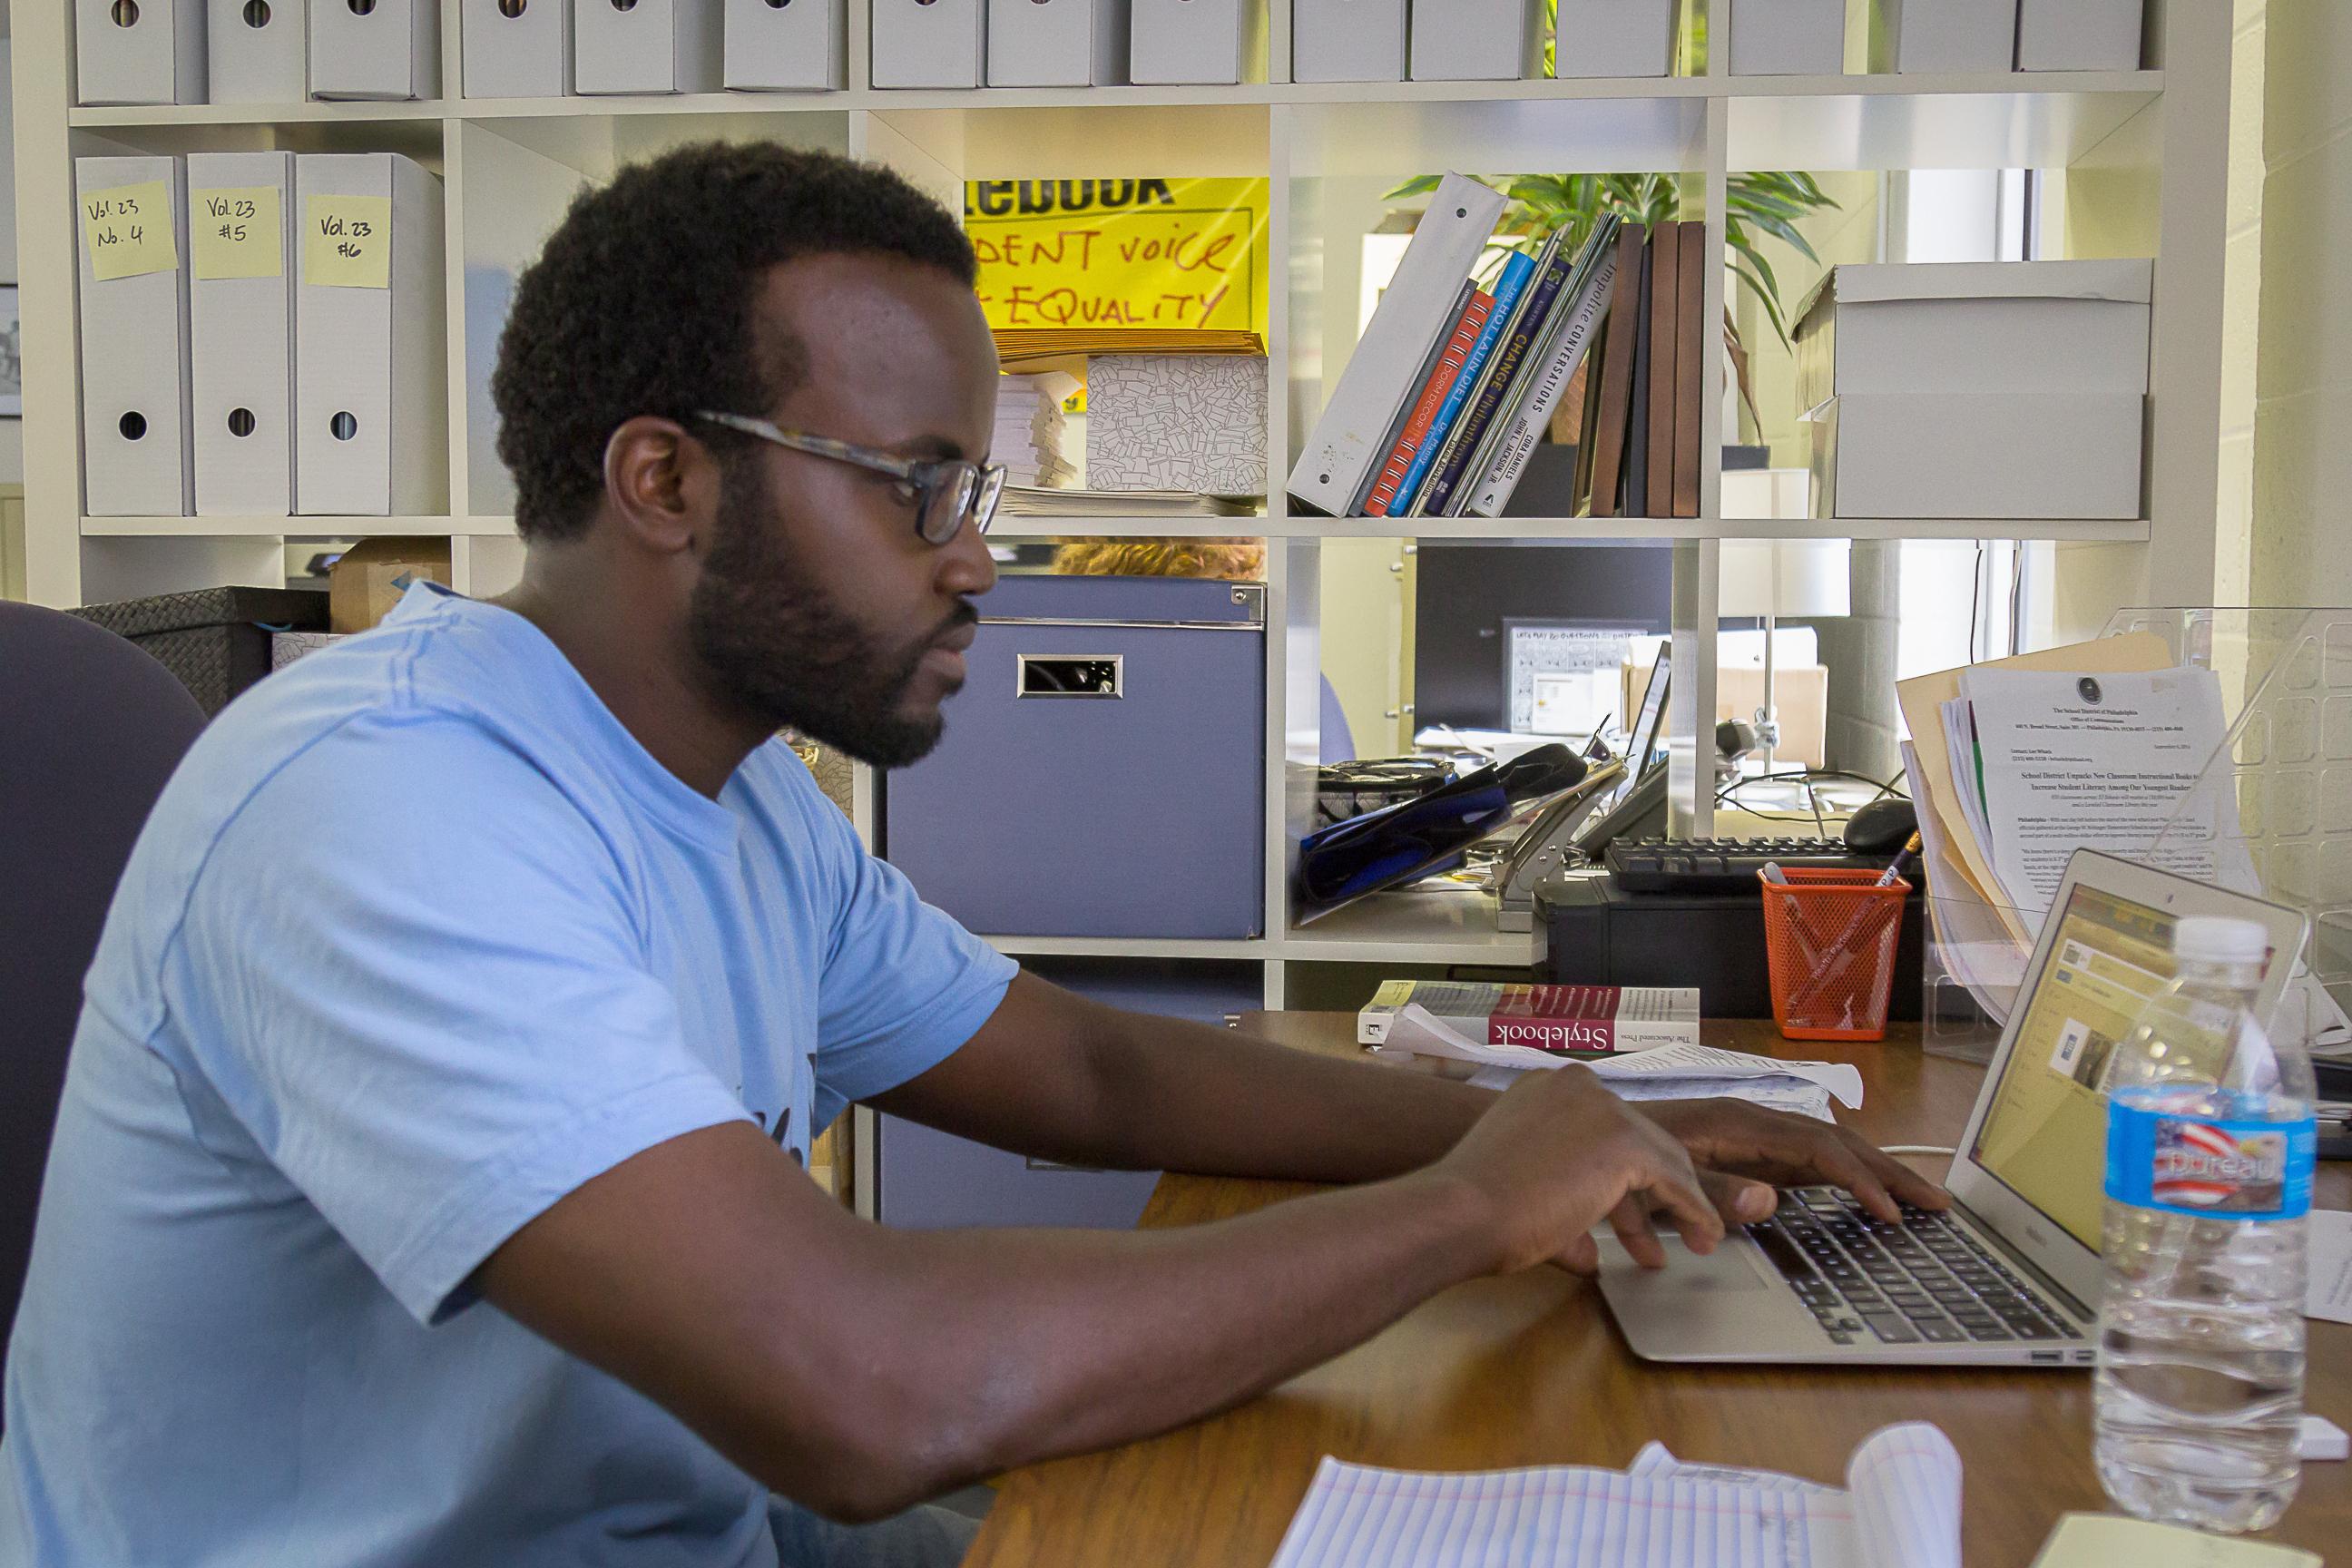 Darryl working on a laptop.